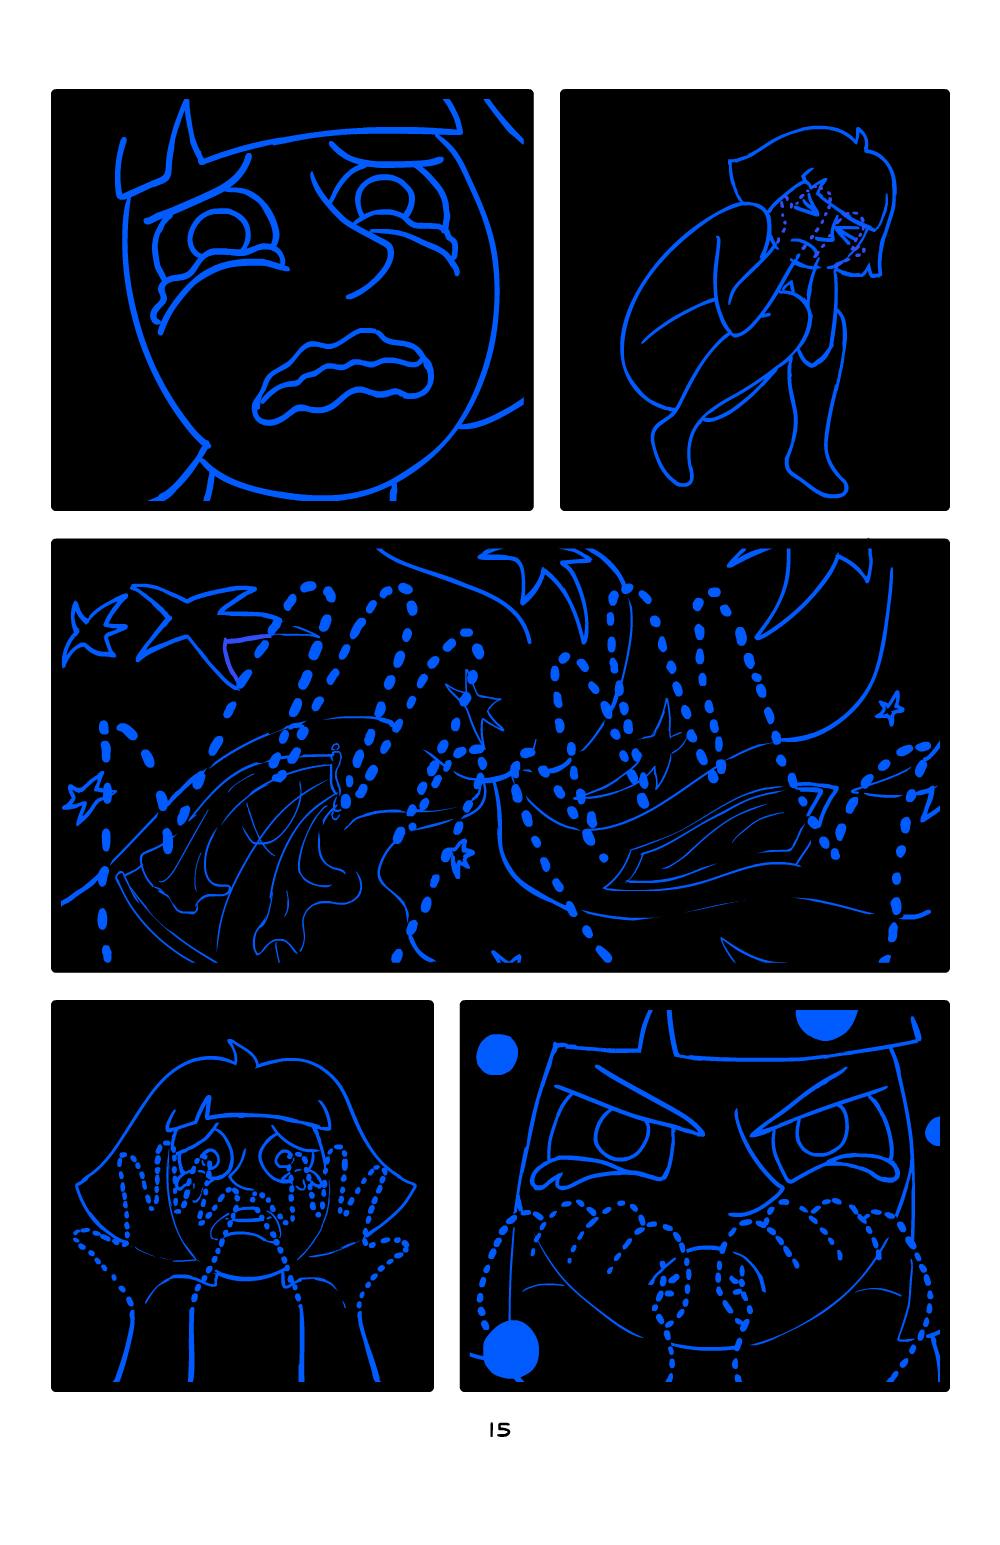 The-Body-Sleeps-9-15-15.jpg